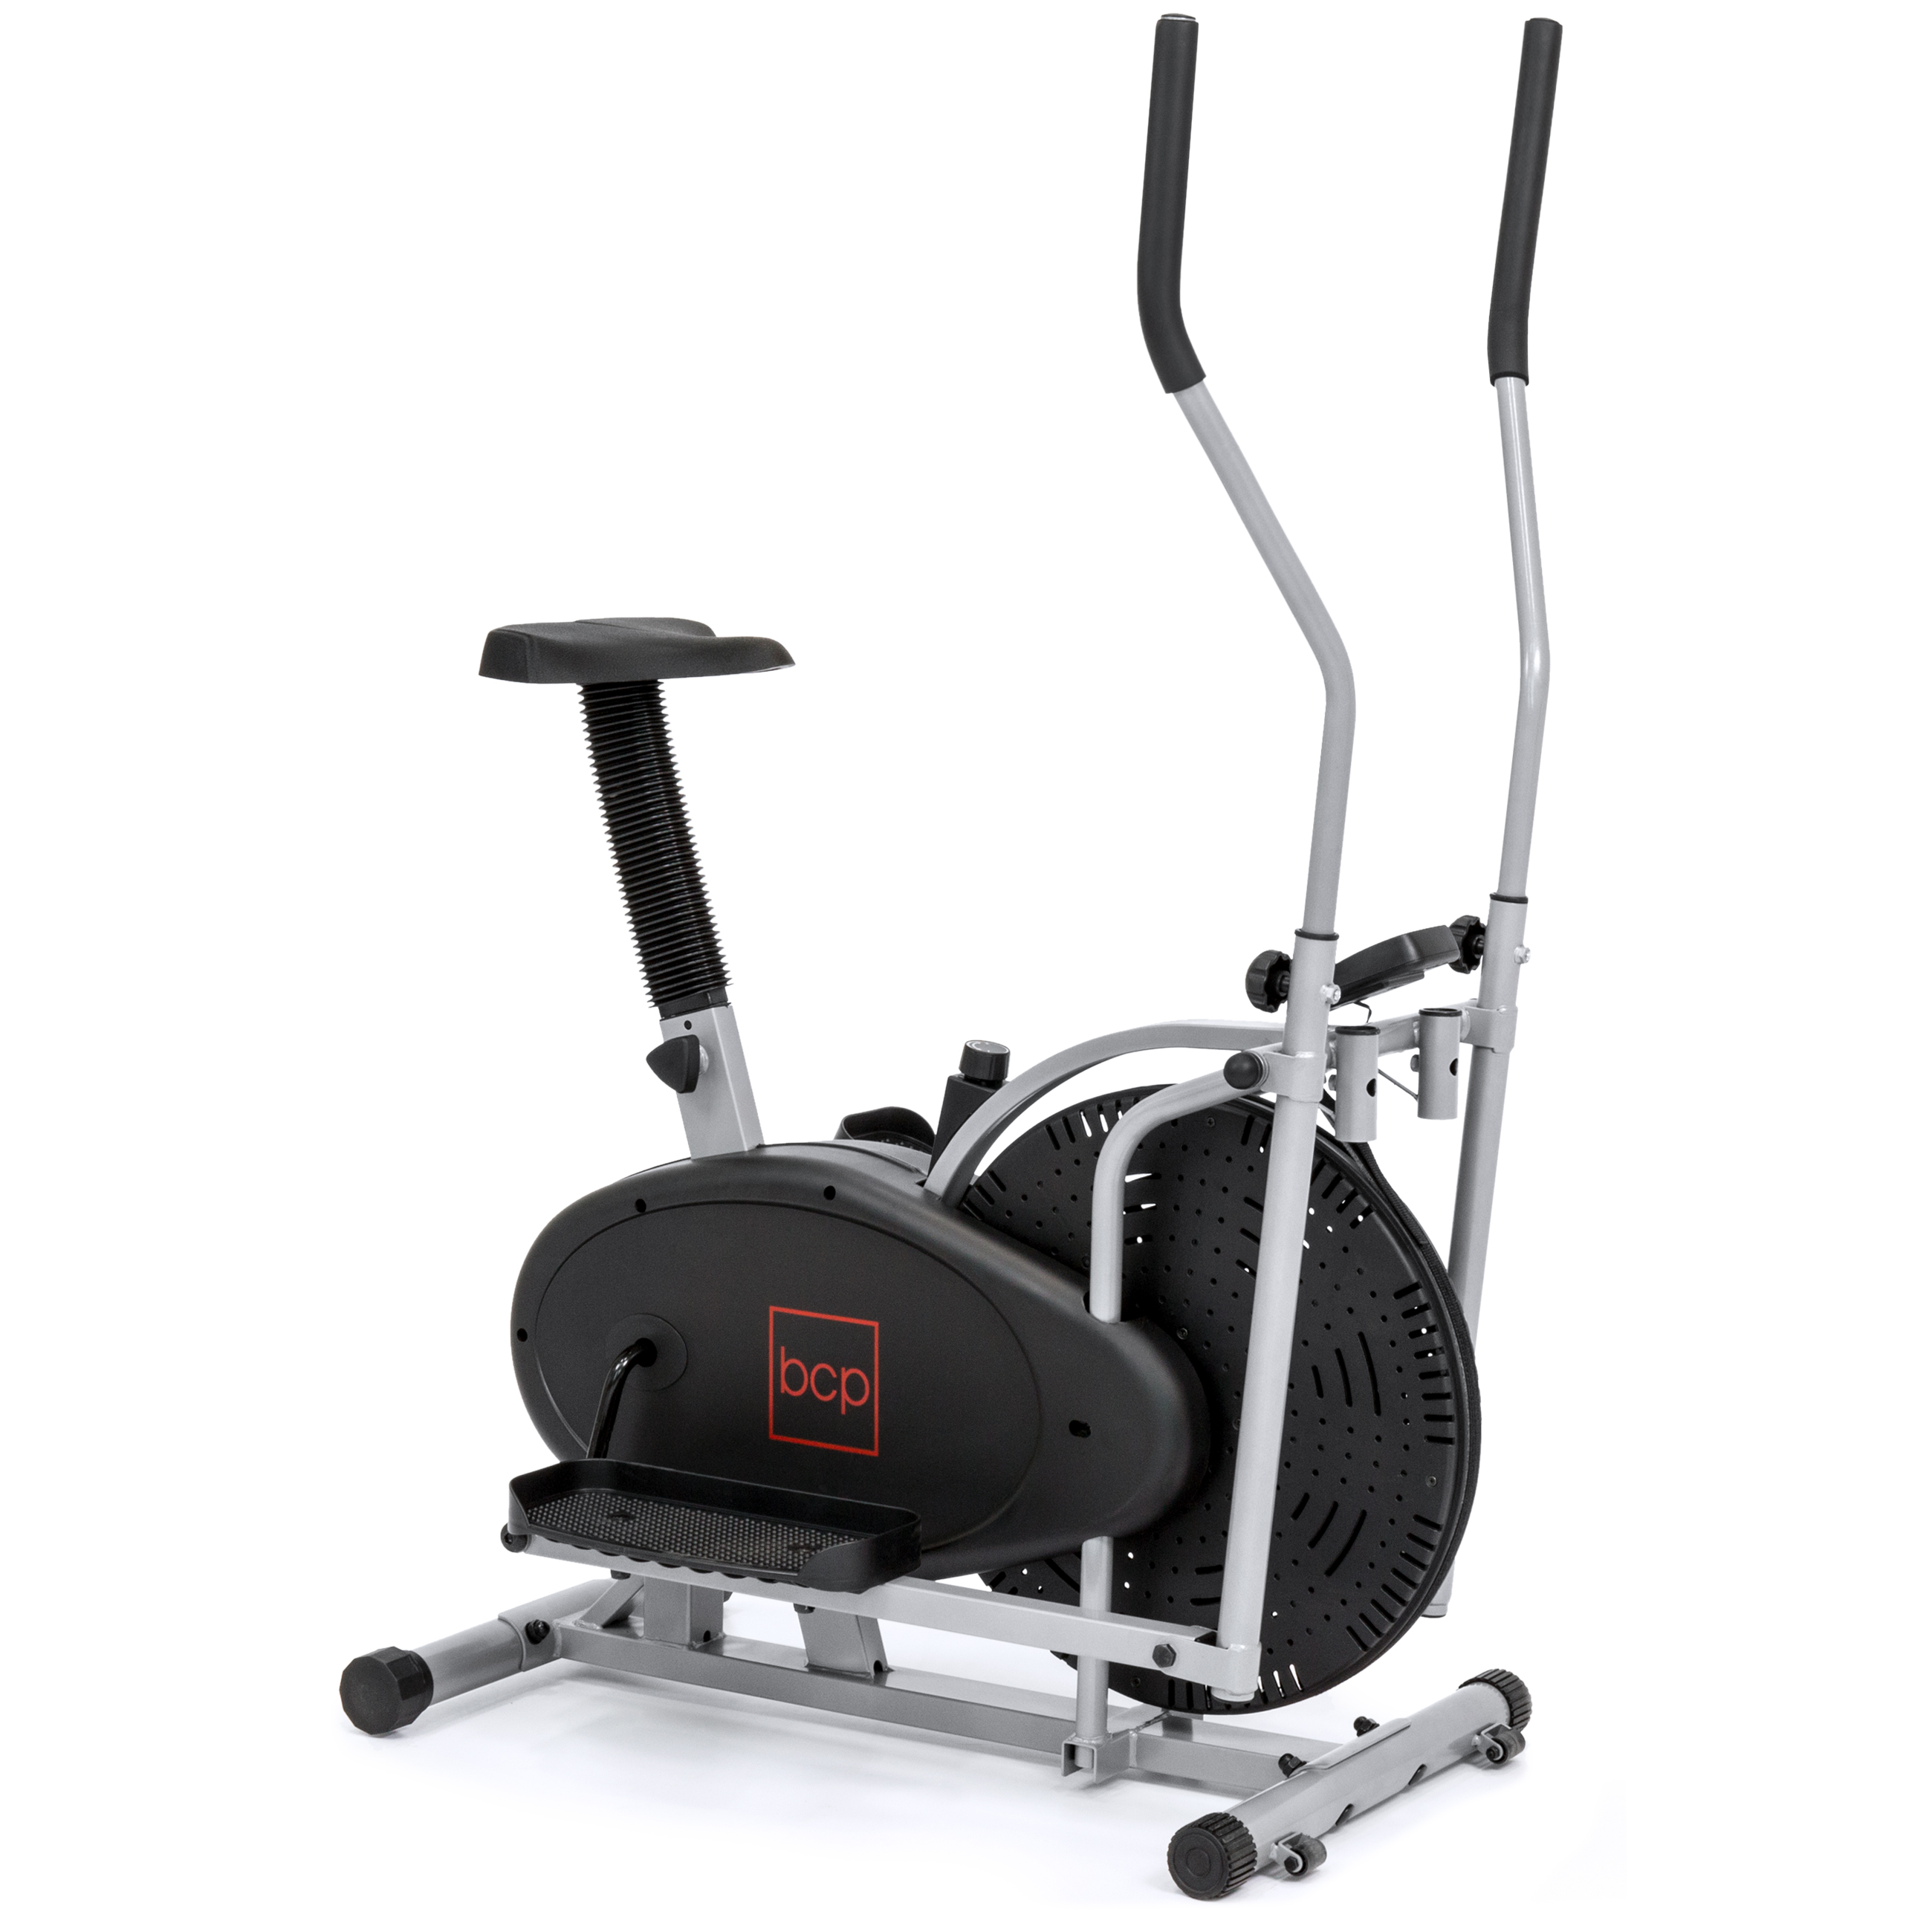 DDI Elliptical Bike 2 IN 1 Cross Trainer Exercise Fitness...